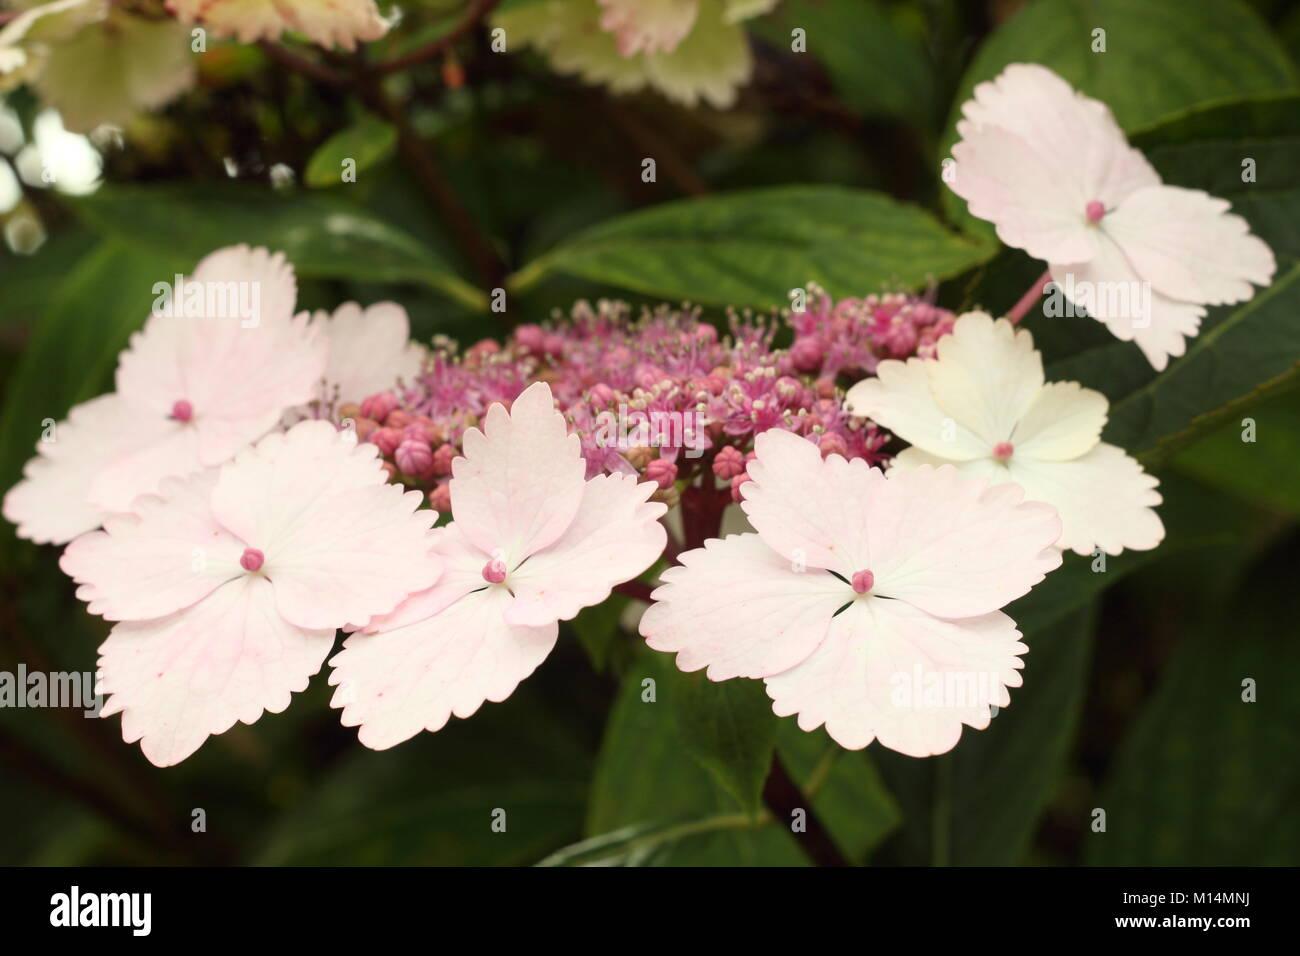 Hydrangea macrophylla 'Nadeshiko-gaku' in flower in a garden border in summer (August), England, UK - Stock Image